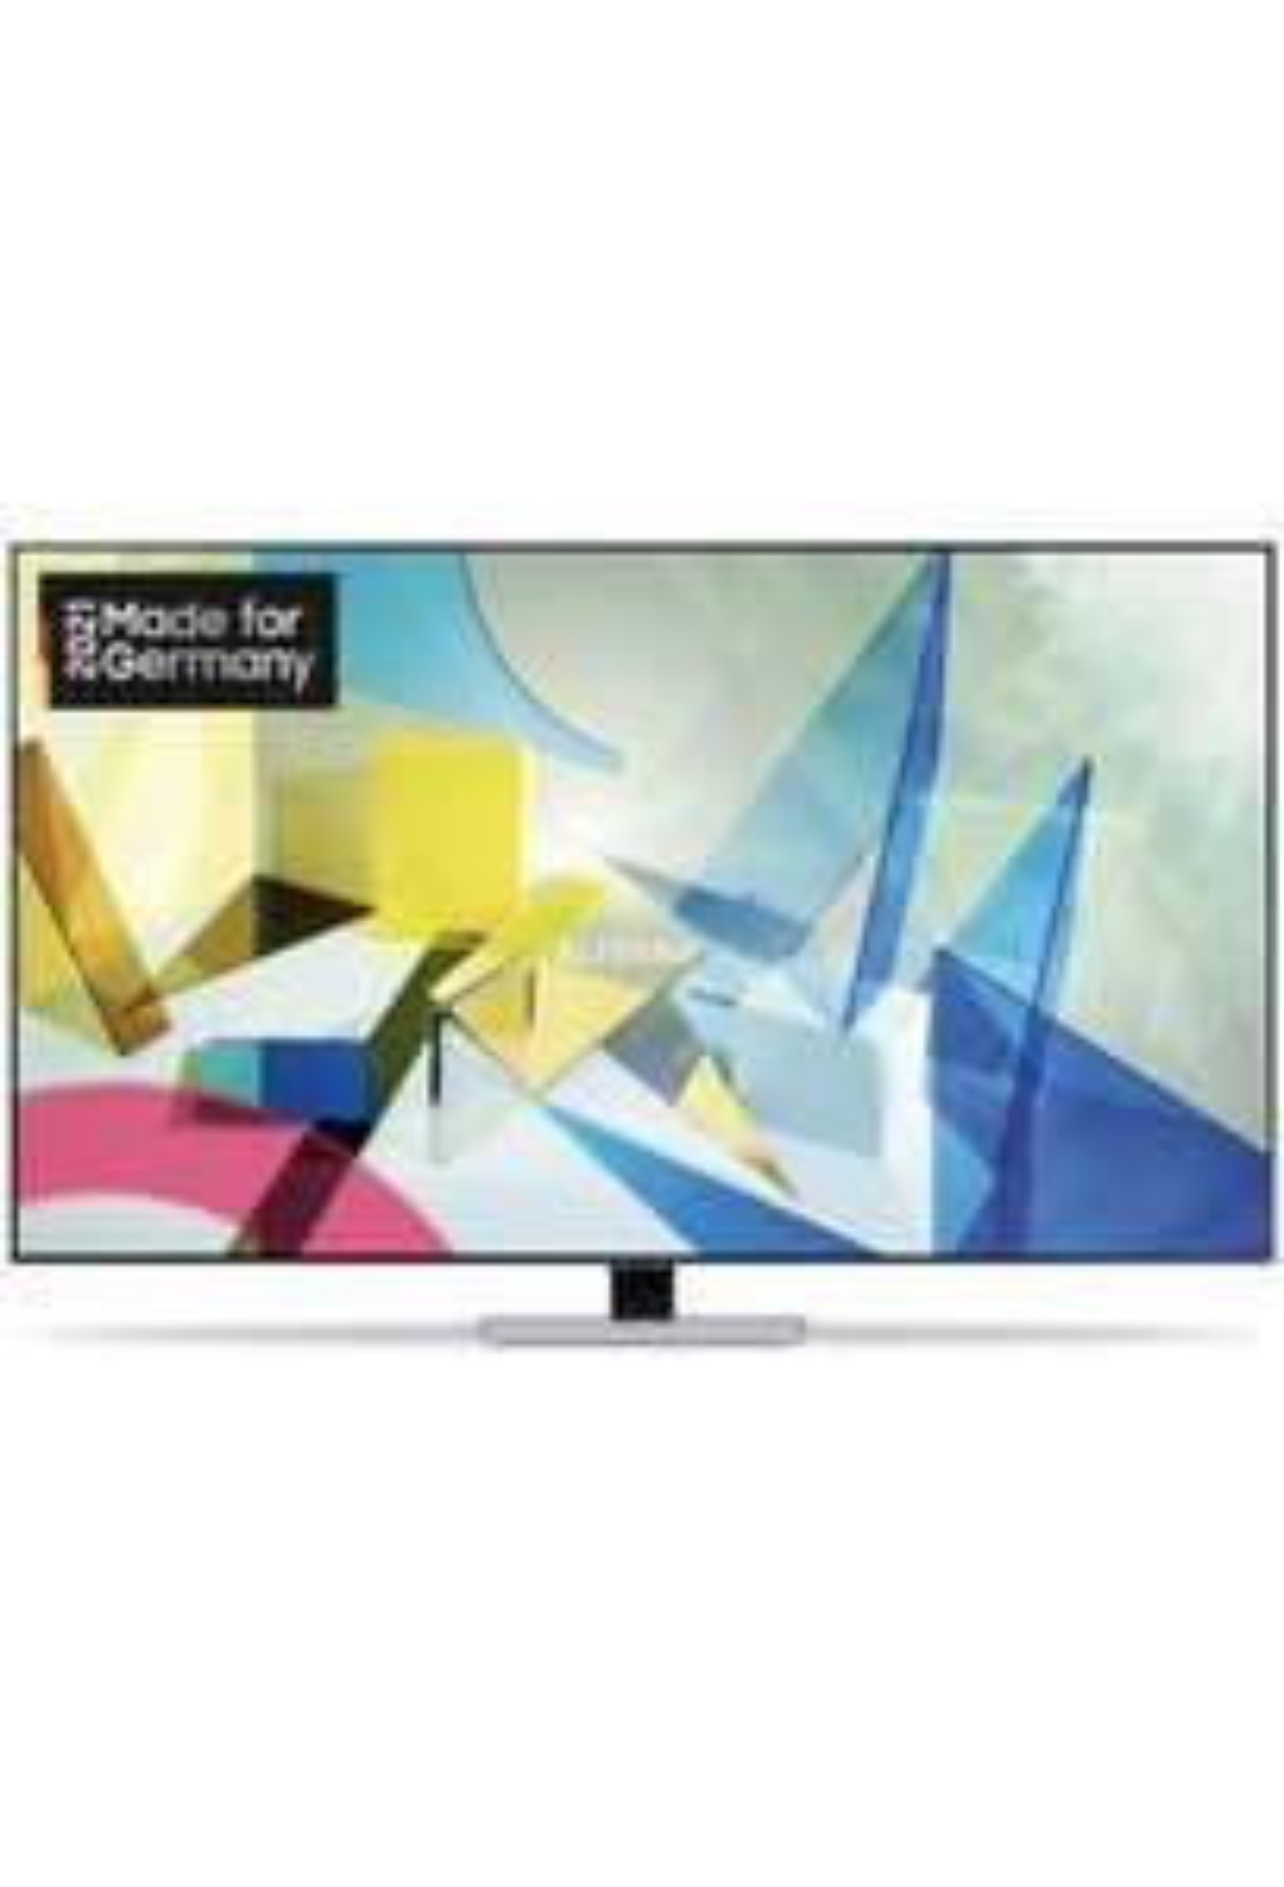 Samsung GQ-55Q84T, QLED-Fernseher (55 Zoll, 4K UHD, 100 Hz Panel, HDMI 2.1)